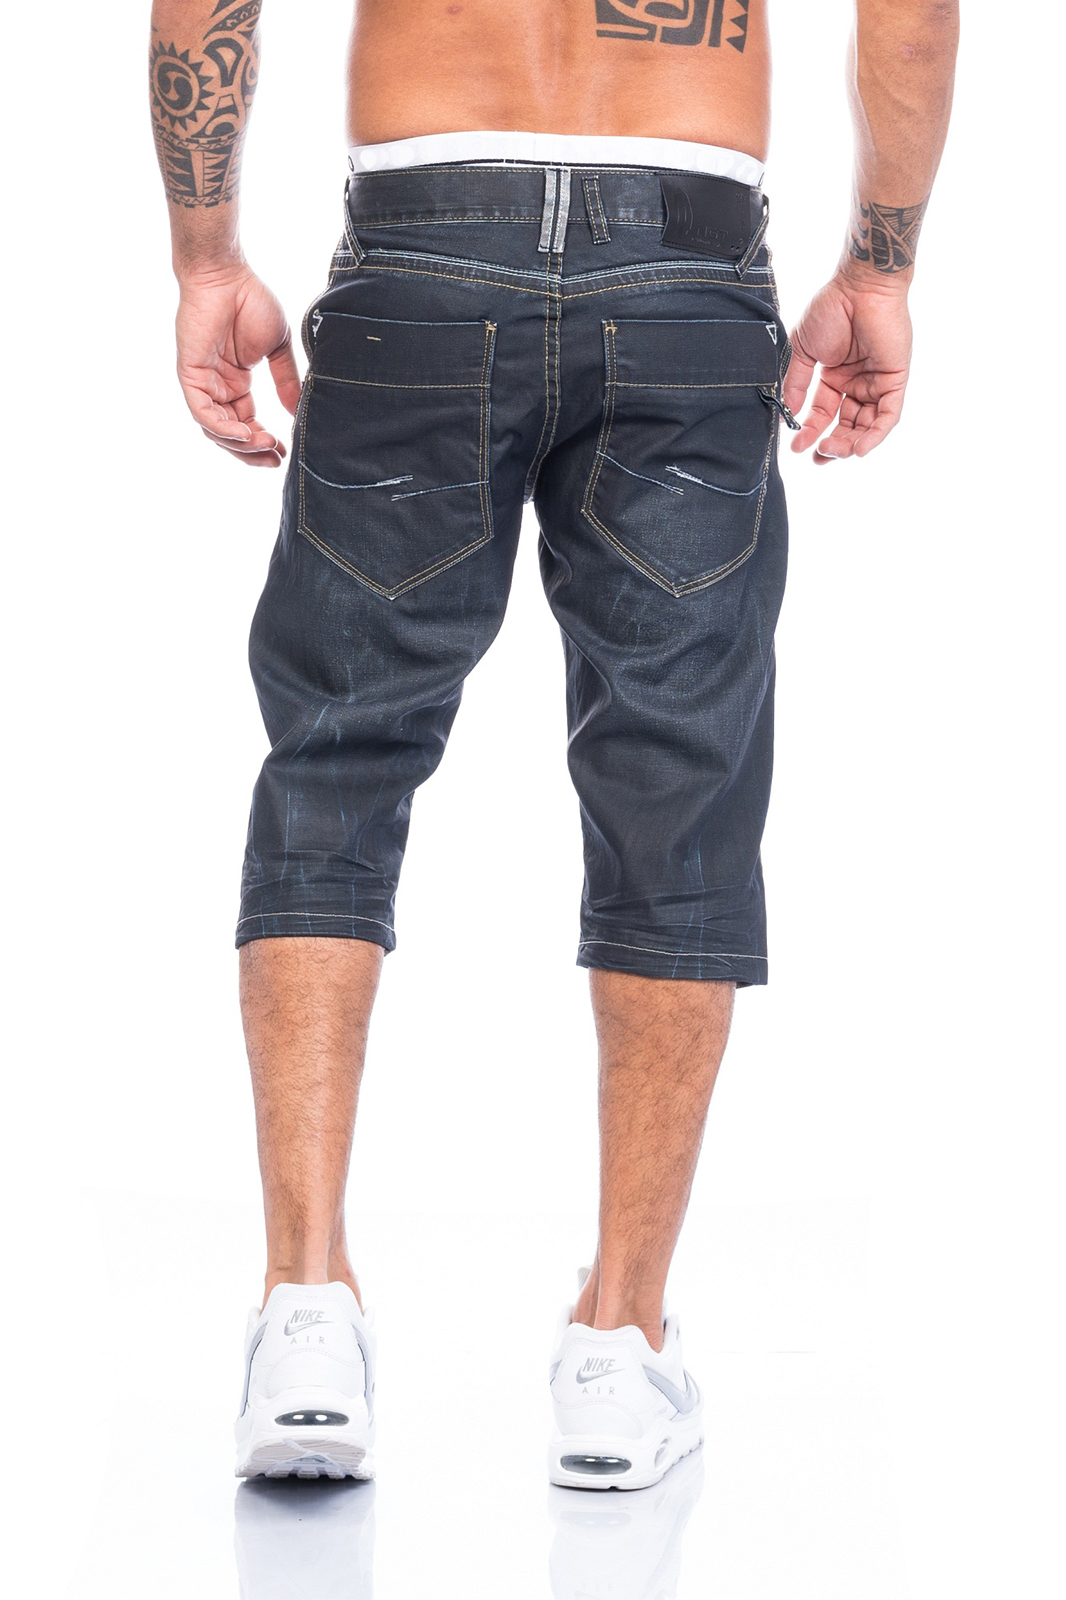 herren bermuda jeans shorts short kurze sommer hose denim h 092 neu ebay. Black Bedroom Furniture Sets. Home Design Ideas